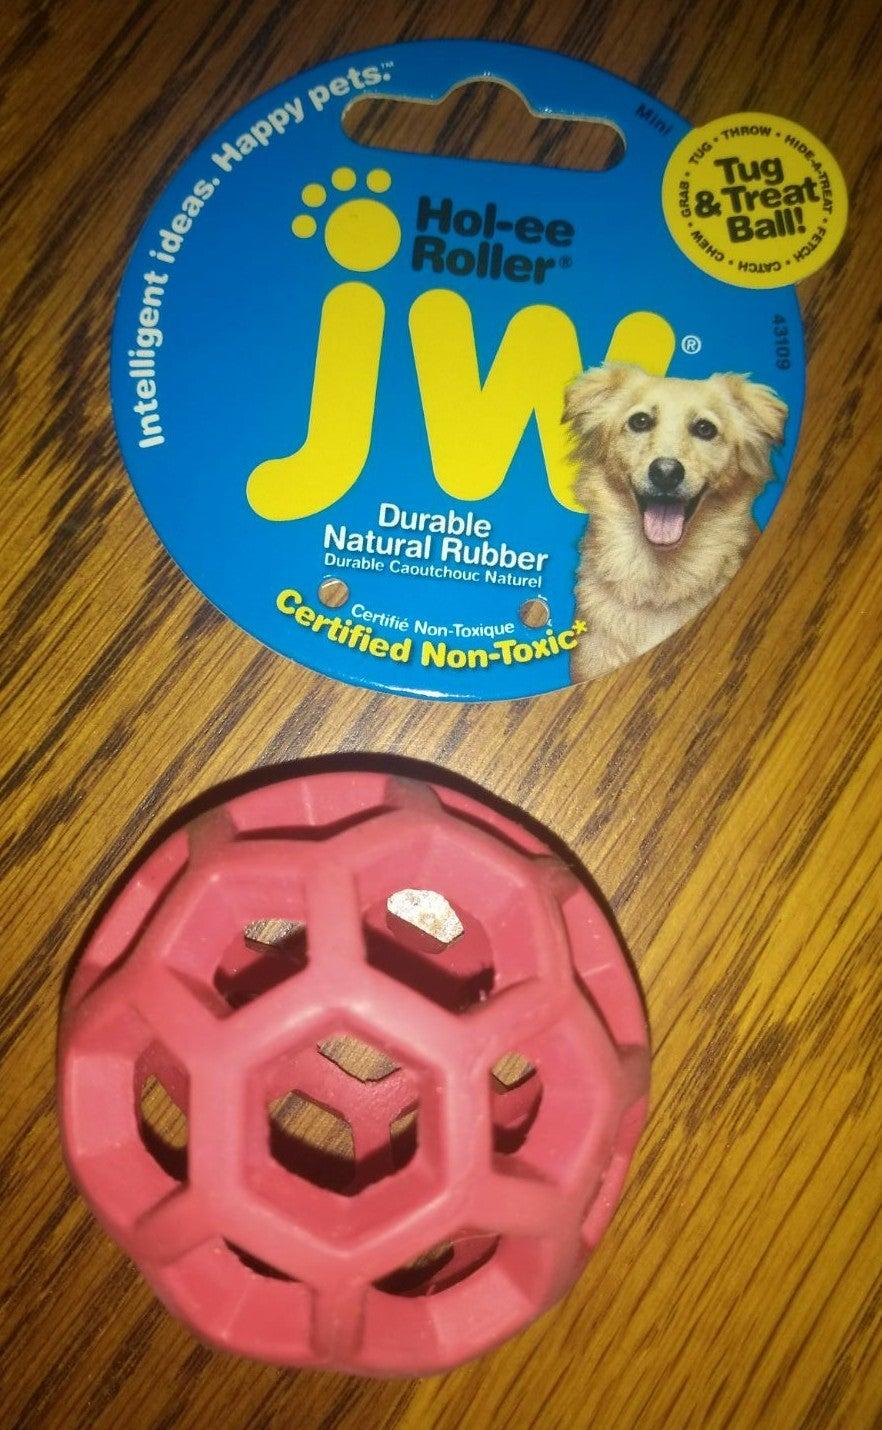 Doggie Tug & Treat Toy Small Hol-ee Roll